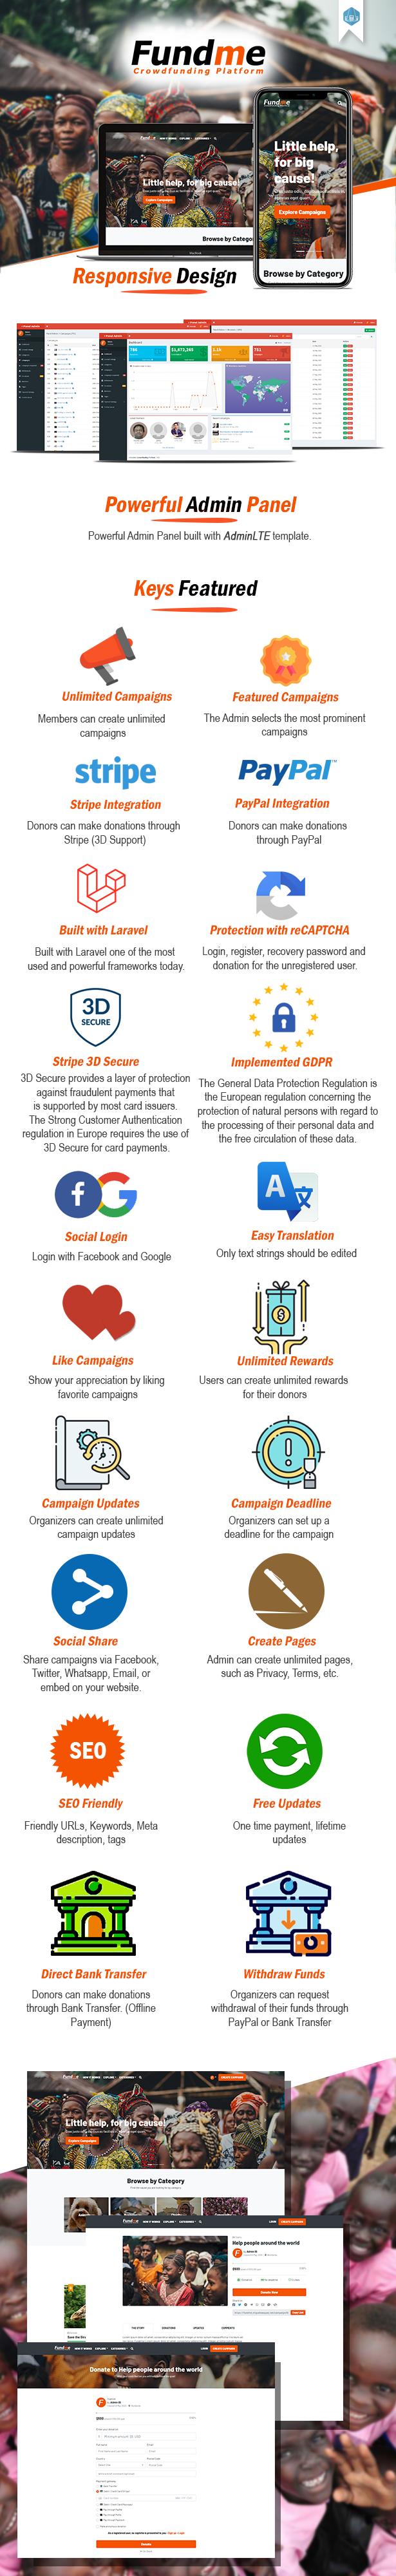 Fundme - Crowdfunding Platform - 1